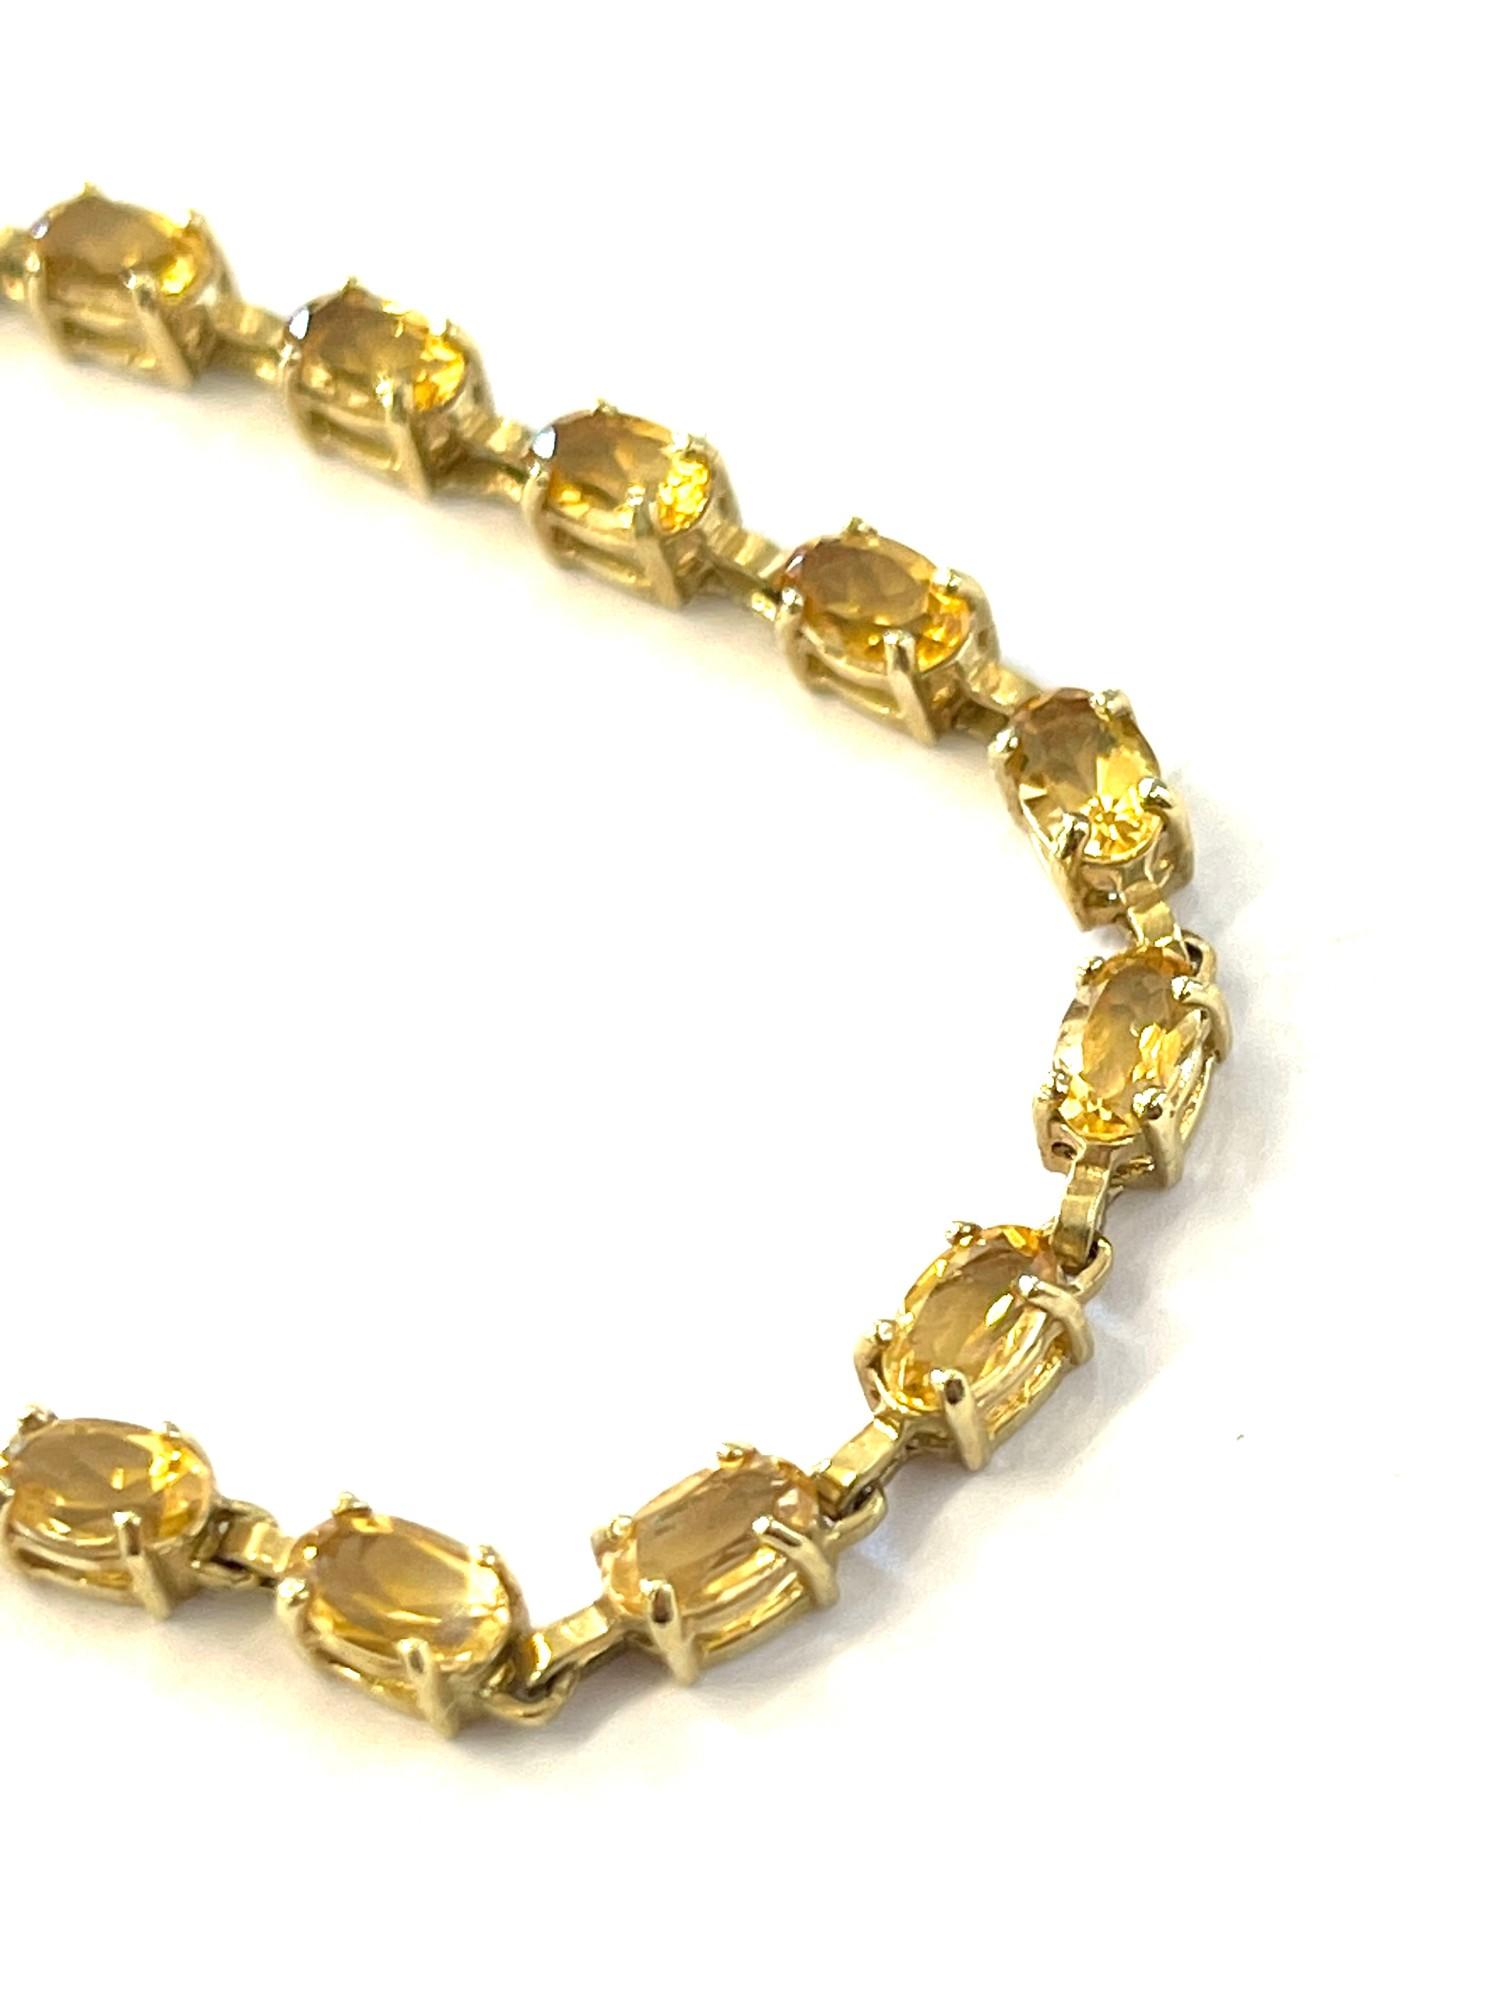 10ct Gold gemstone tennis bracelet - Image 2 of 2